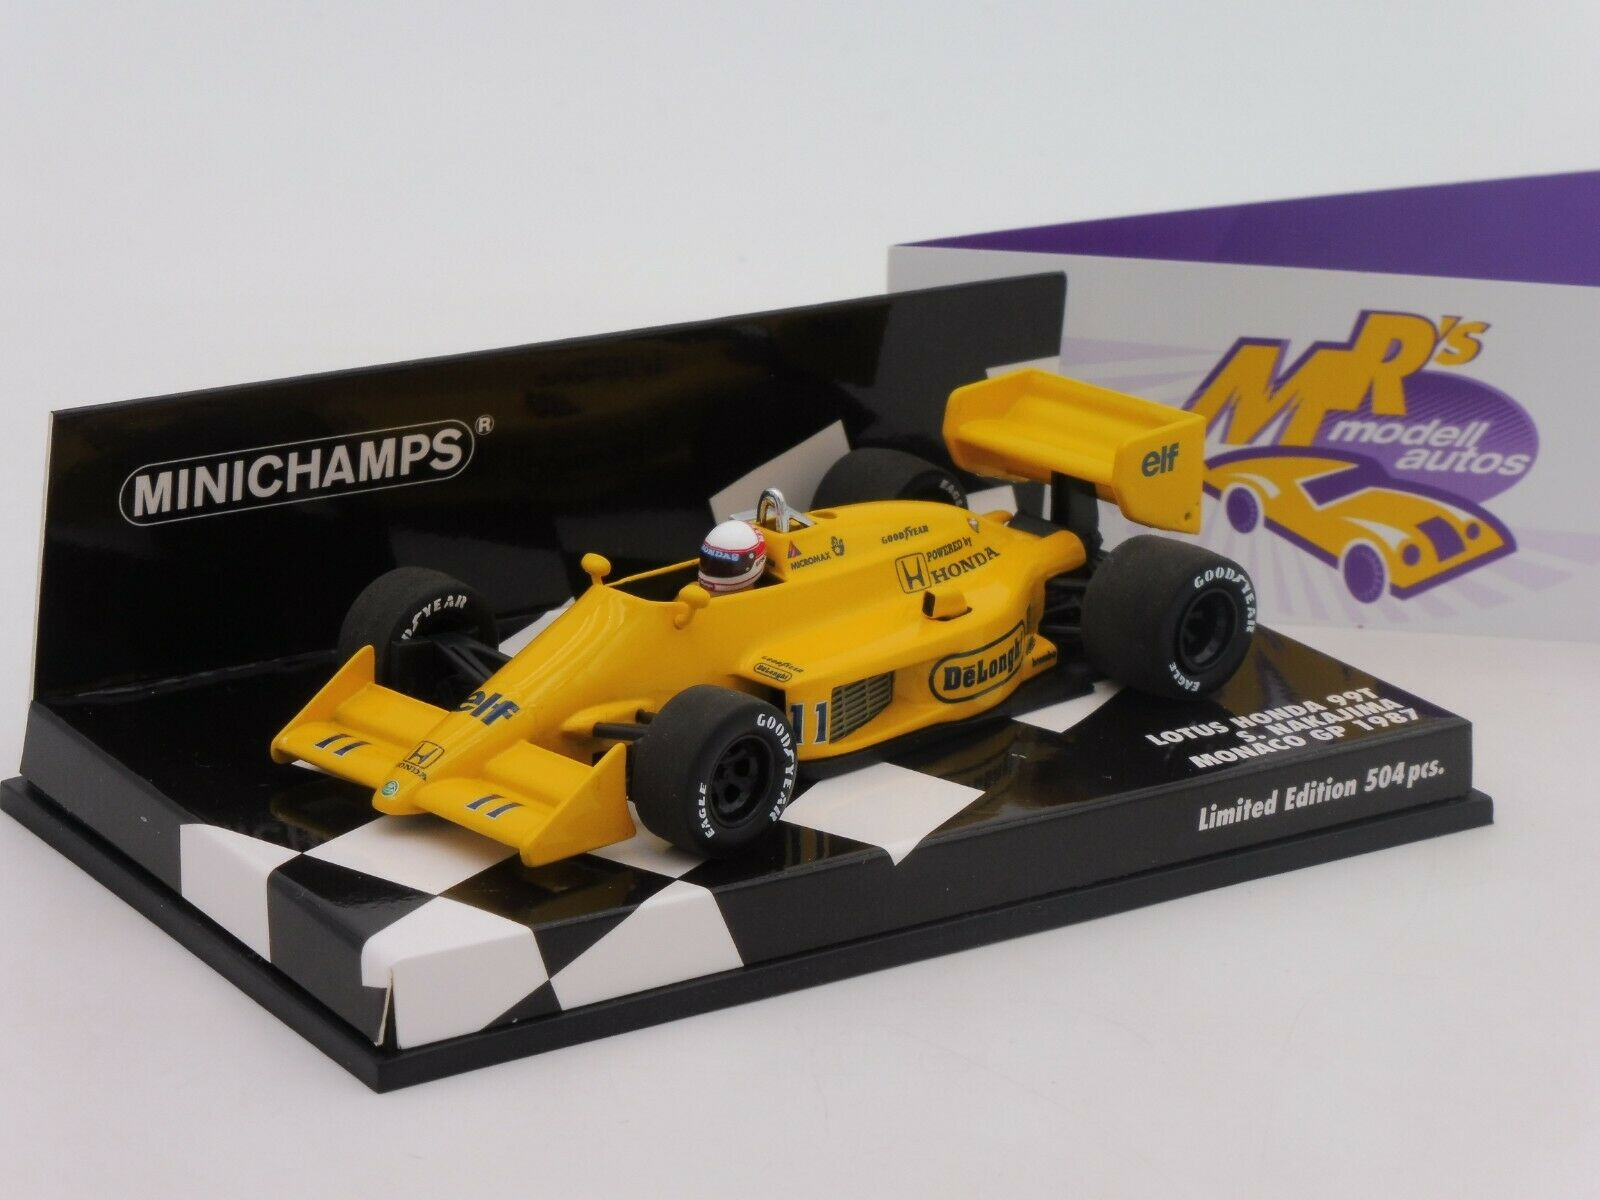 MINICHAMPS 400870011    Lotus Honda 99 T Nº 11 S Nakajima-Monaco Gp 1 43 NEUF  le réseau le plus bas